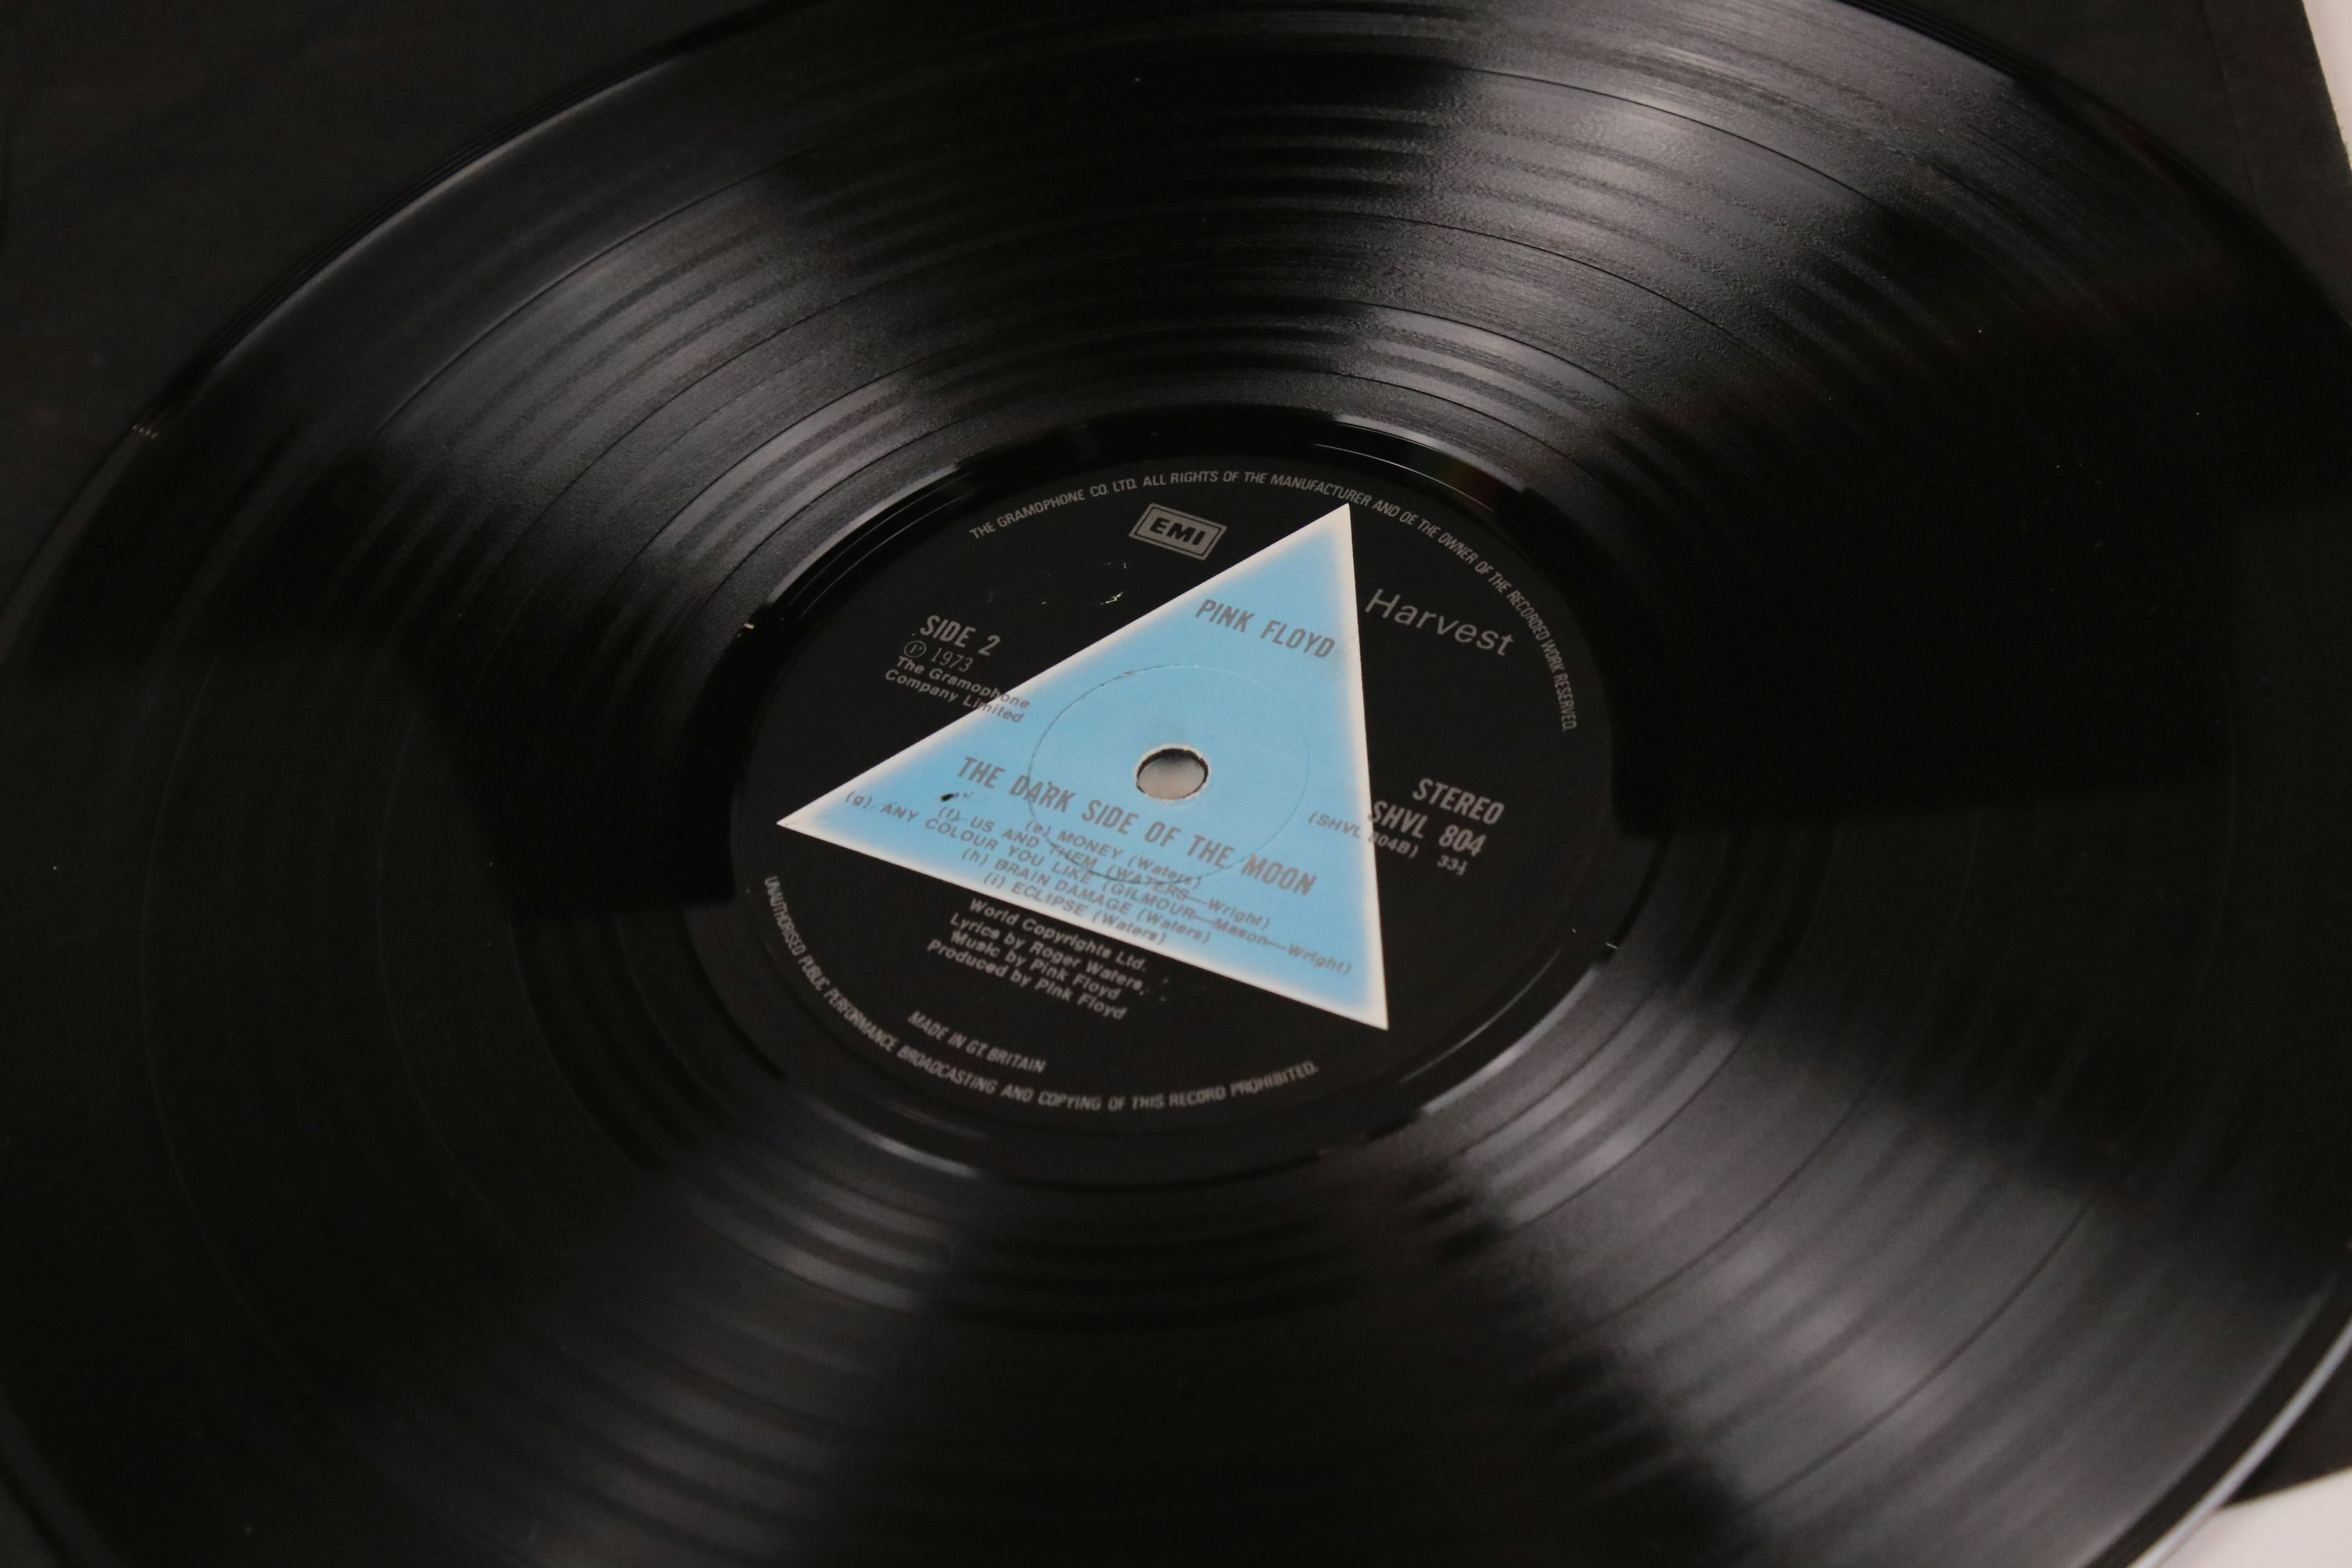 Vinyl - Pink Floyd Dark Side of The Moon LP on Harvest SHVL804 Stereo, solid light blue triangle, no - Image 4 of 6